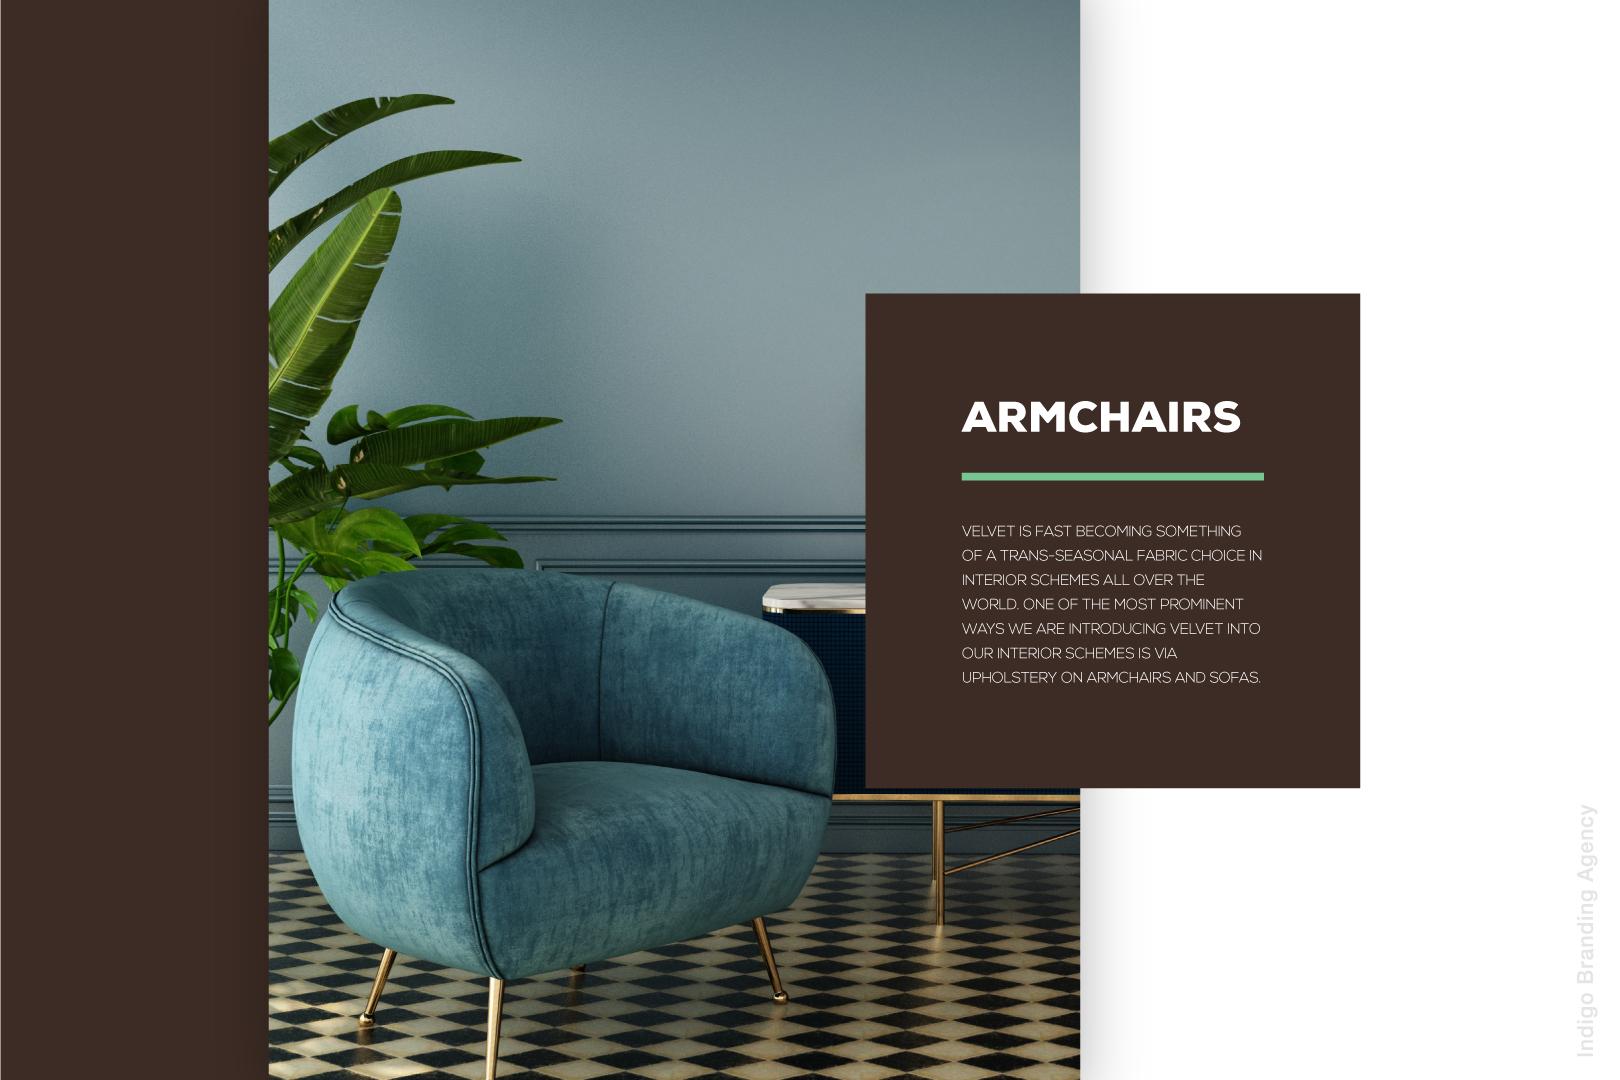 bergman woodz furniture production design wood branding logo design naming indigo branding quality furniture velvet armchair description